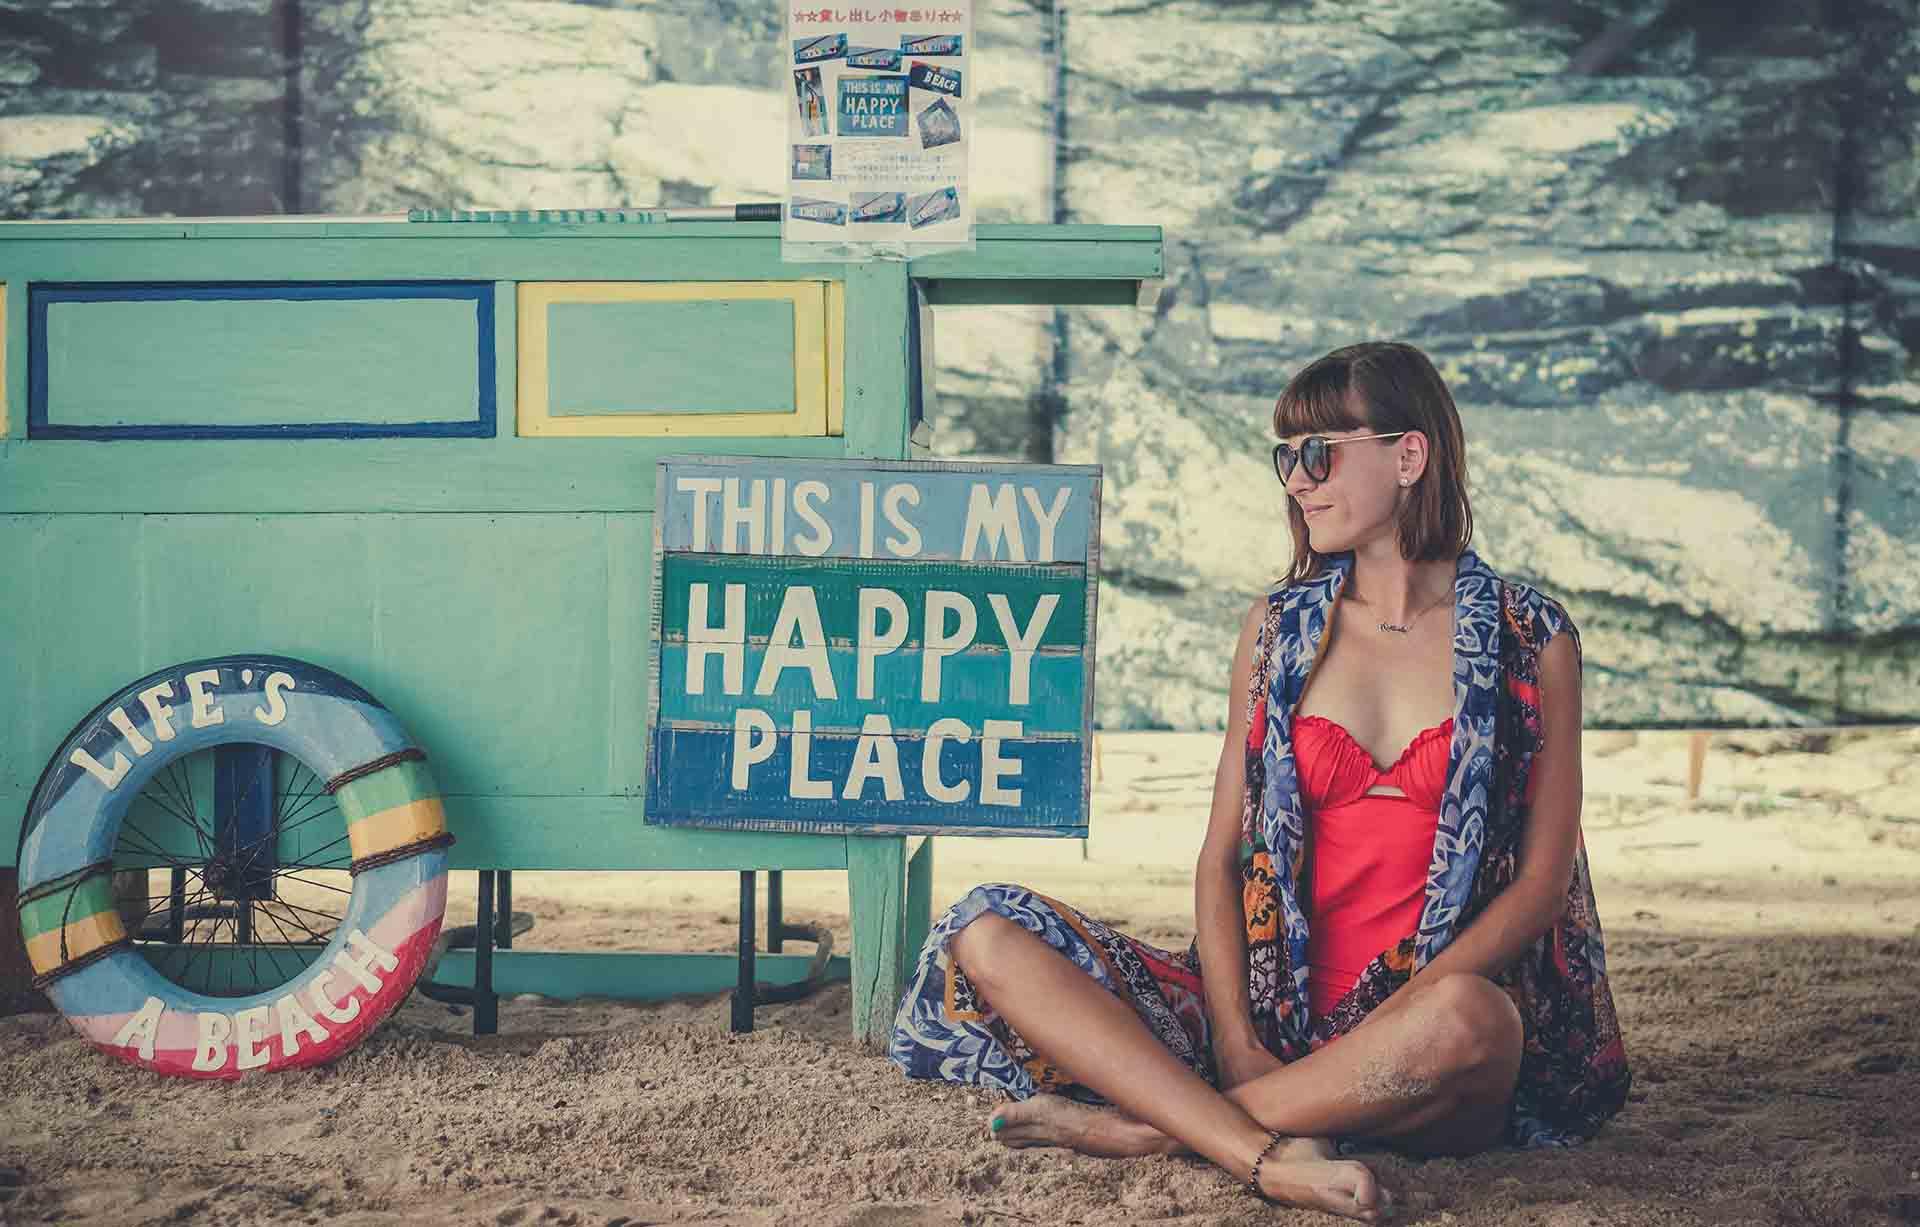 accettare se stessi unicità felicità ikigai